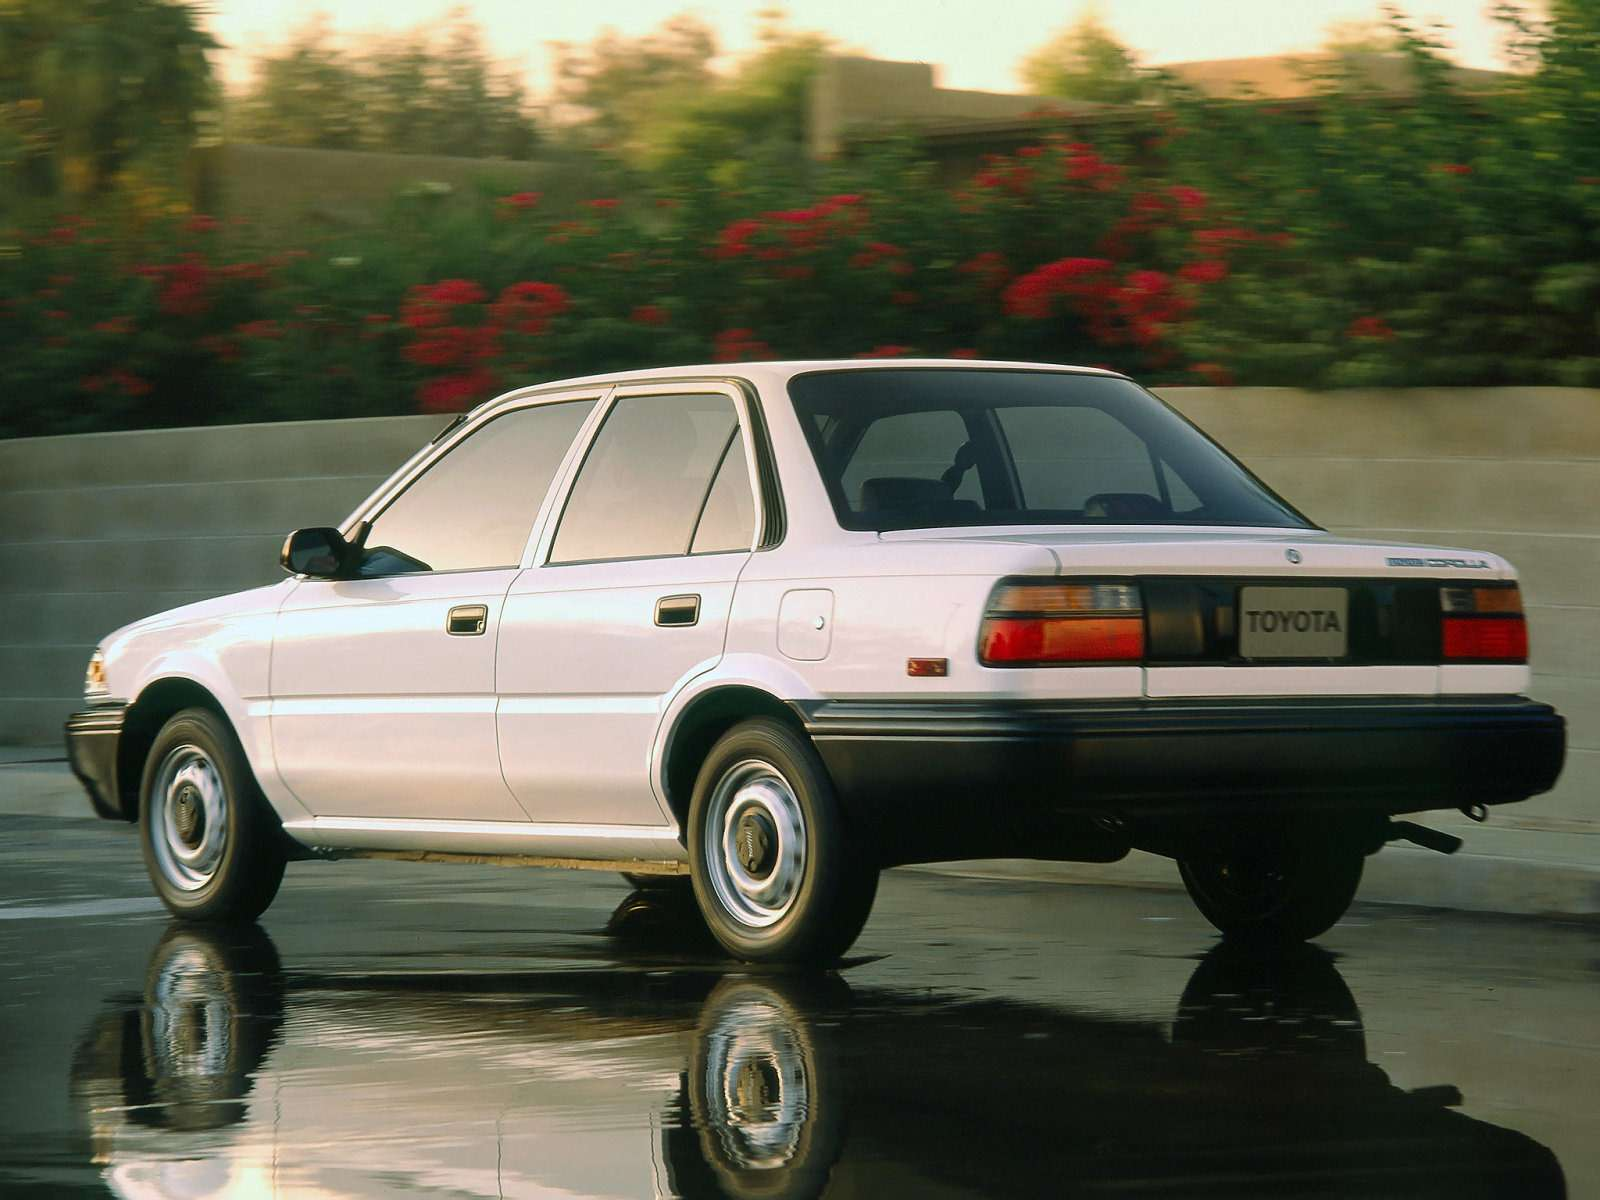 Toyota_Corolla_Sedan_1987_1